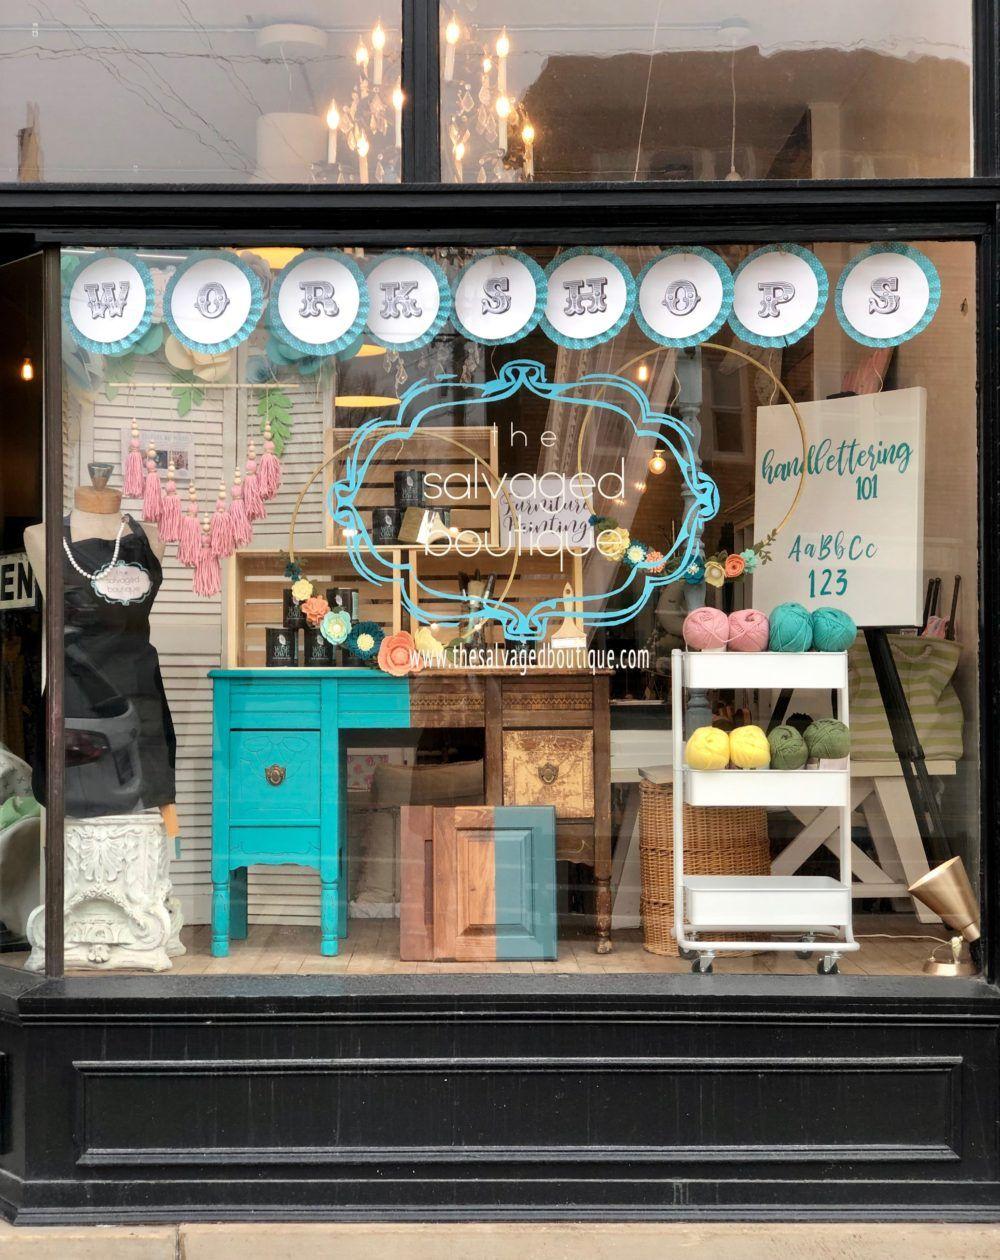 Diy Window Display Ideas For A Brick And Mortar Store Darice Window Display Retail Diy Window Store Window Displays Showroom showcase eye candy